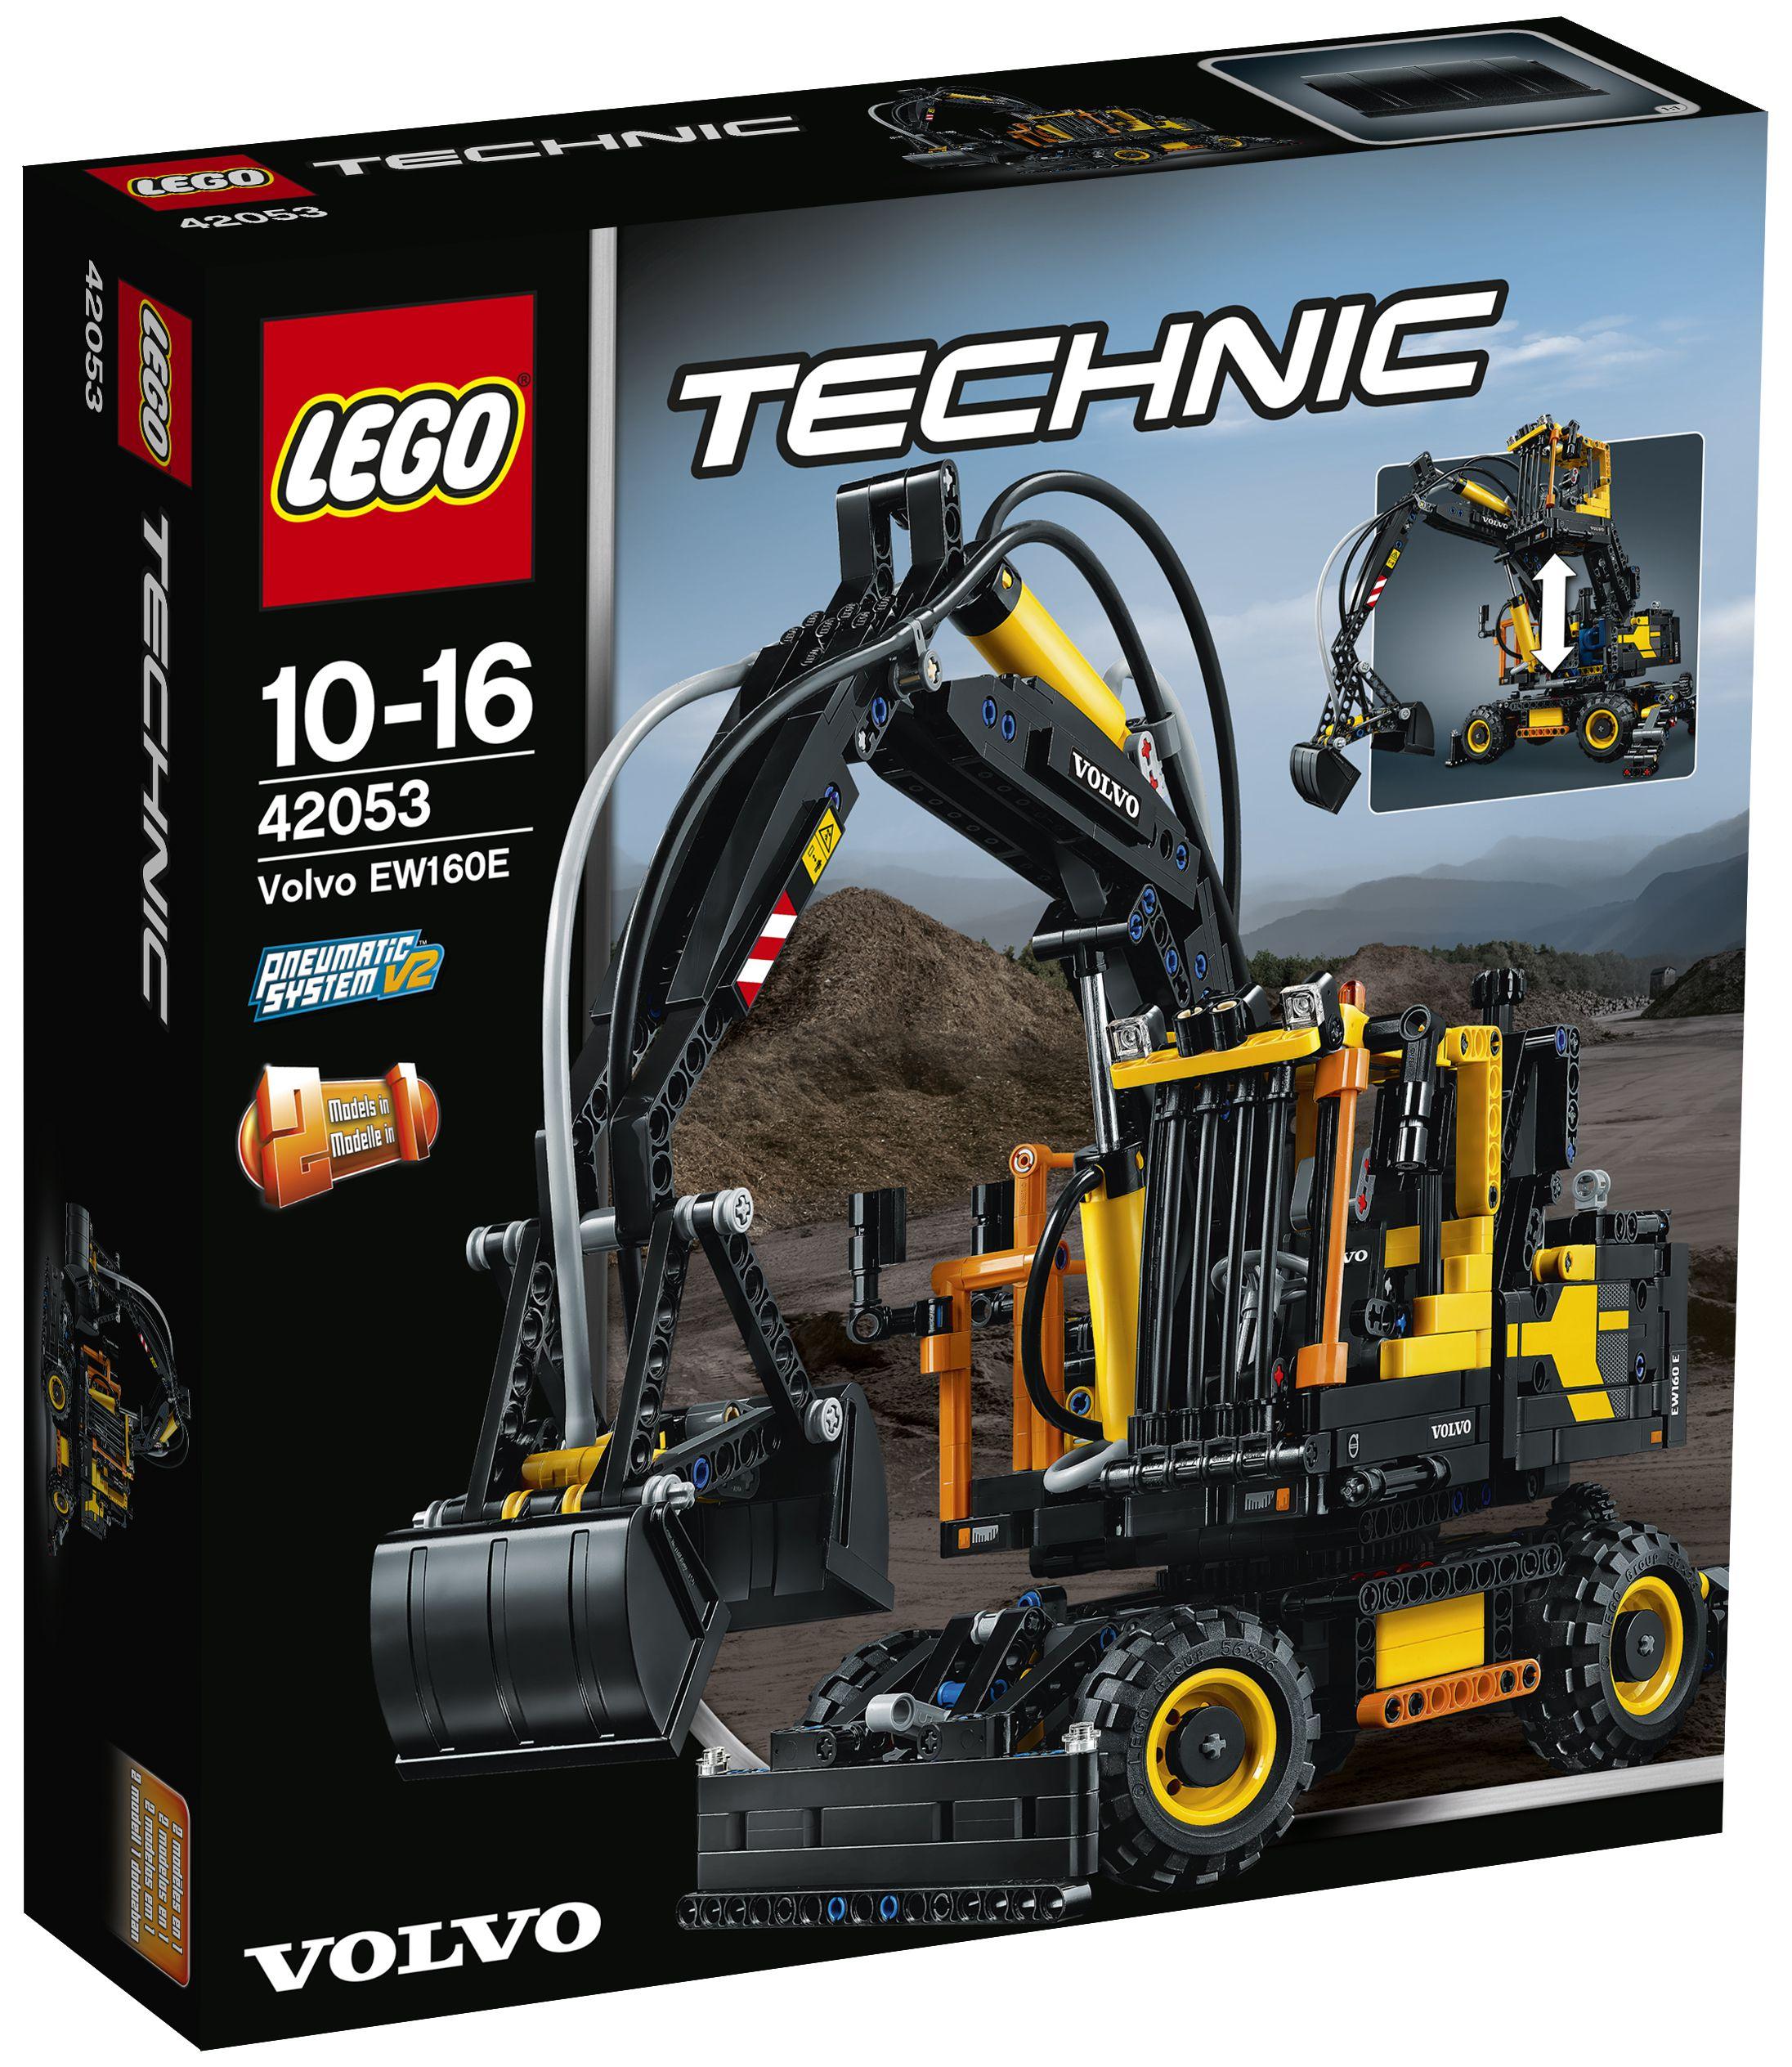 lego technic 42053 volvo ew160e achat vente assemblage construction cdiscount. Black Bedroom Furniture Sets. Home Design Ideas